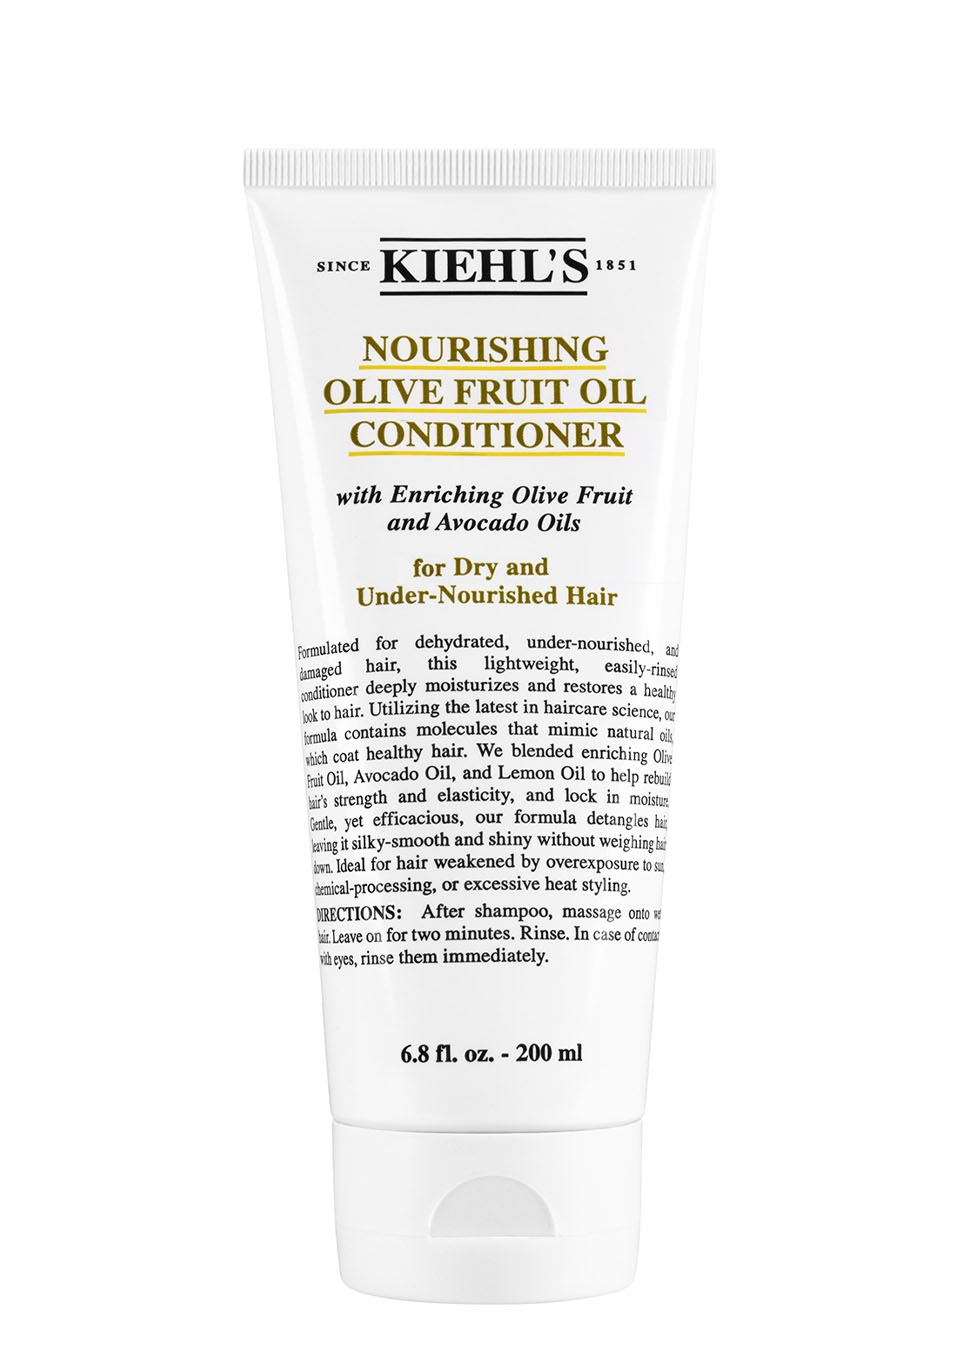 Olive Fruit Oil Nourishing Conditioner 200ml